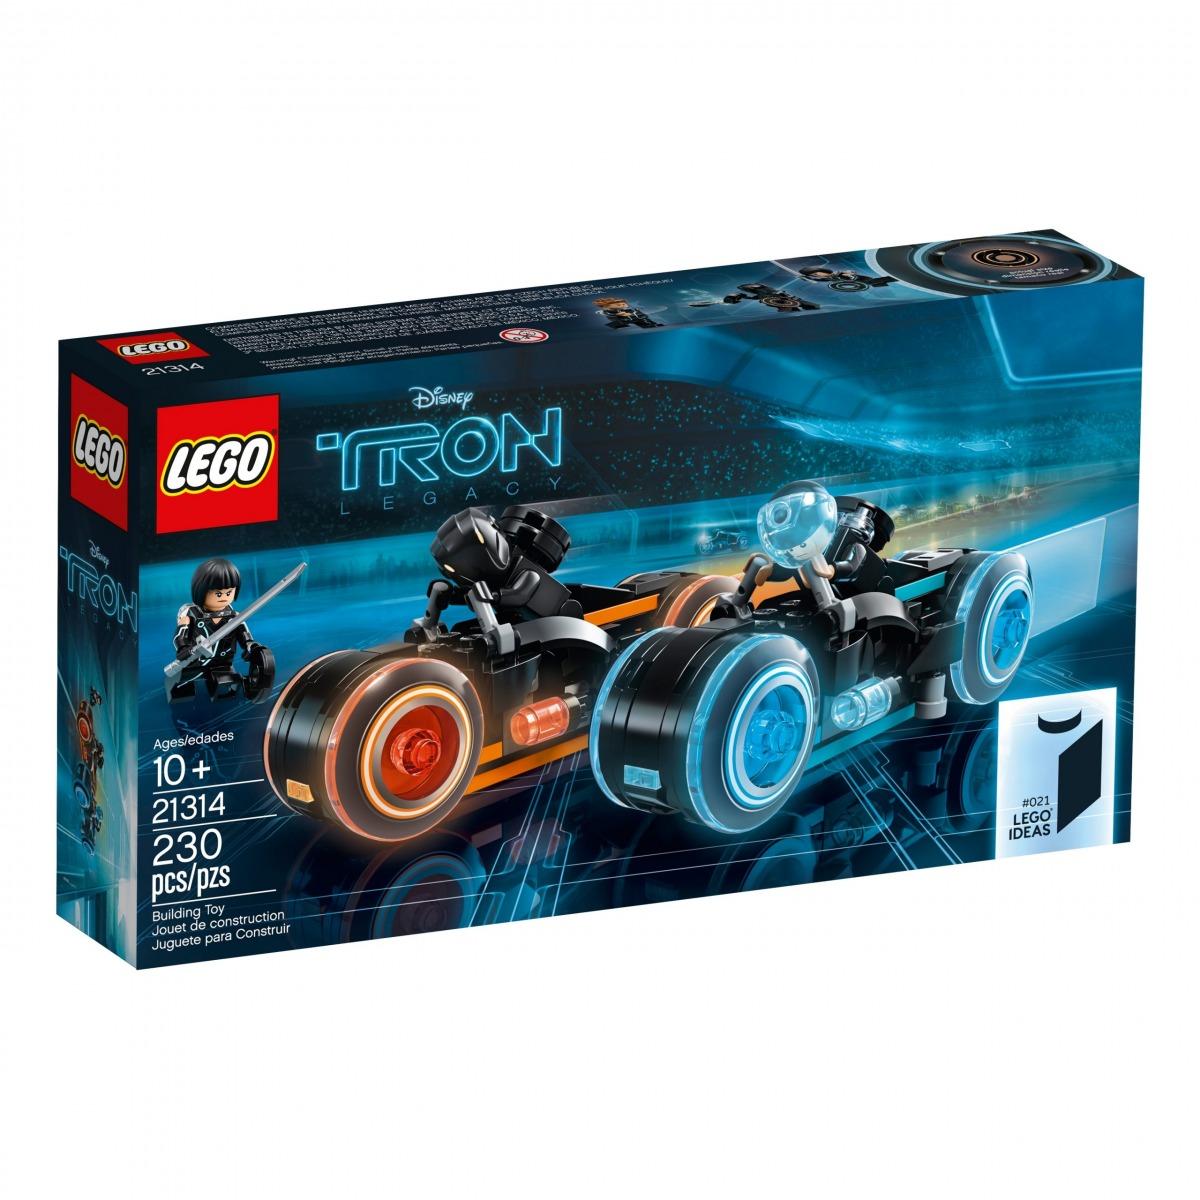 lego 21314 tron legacy scaled